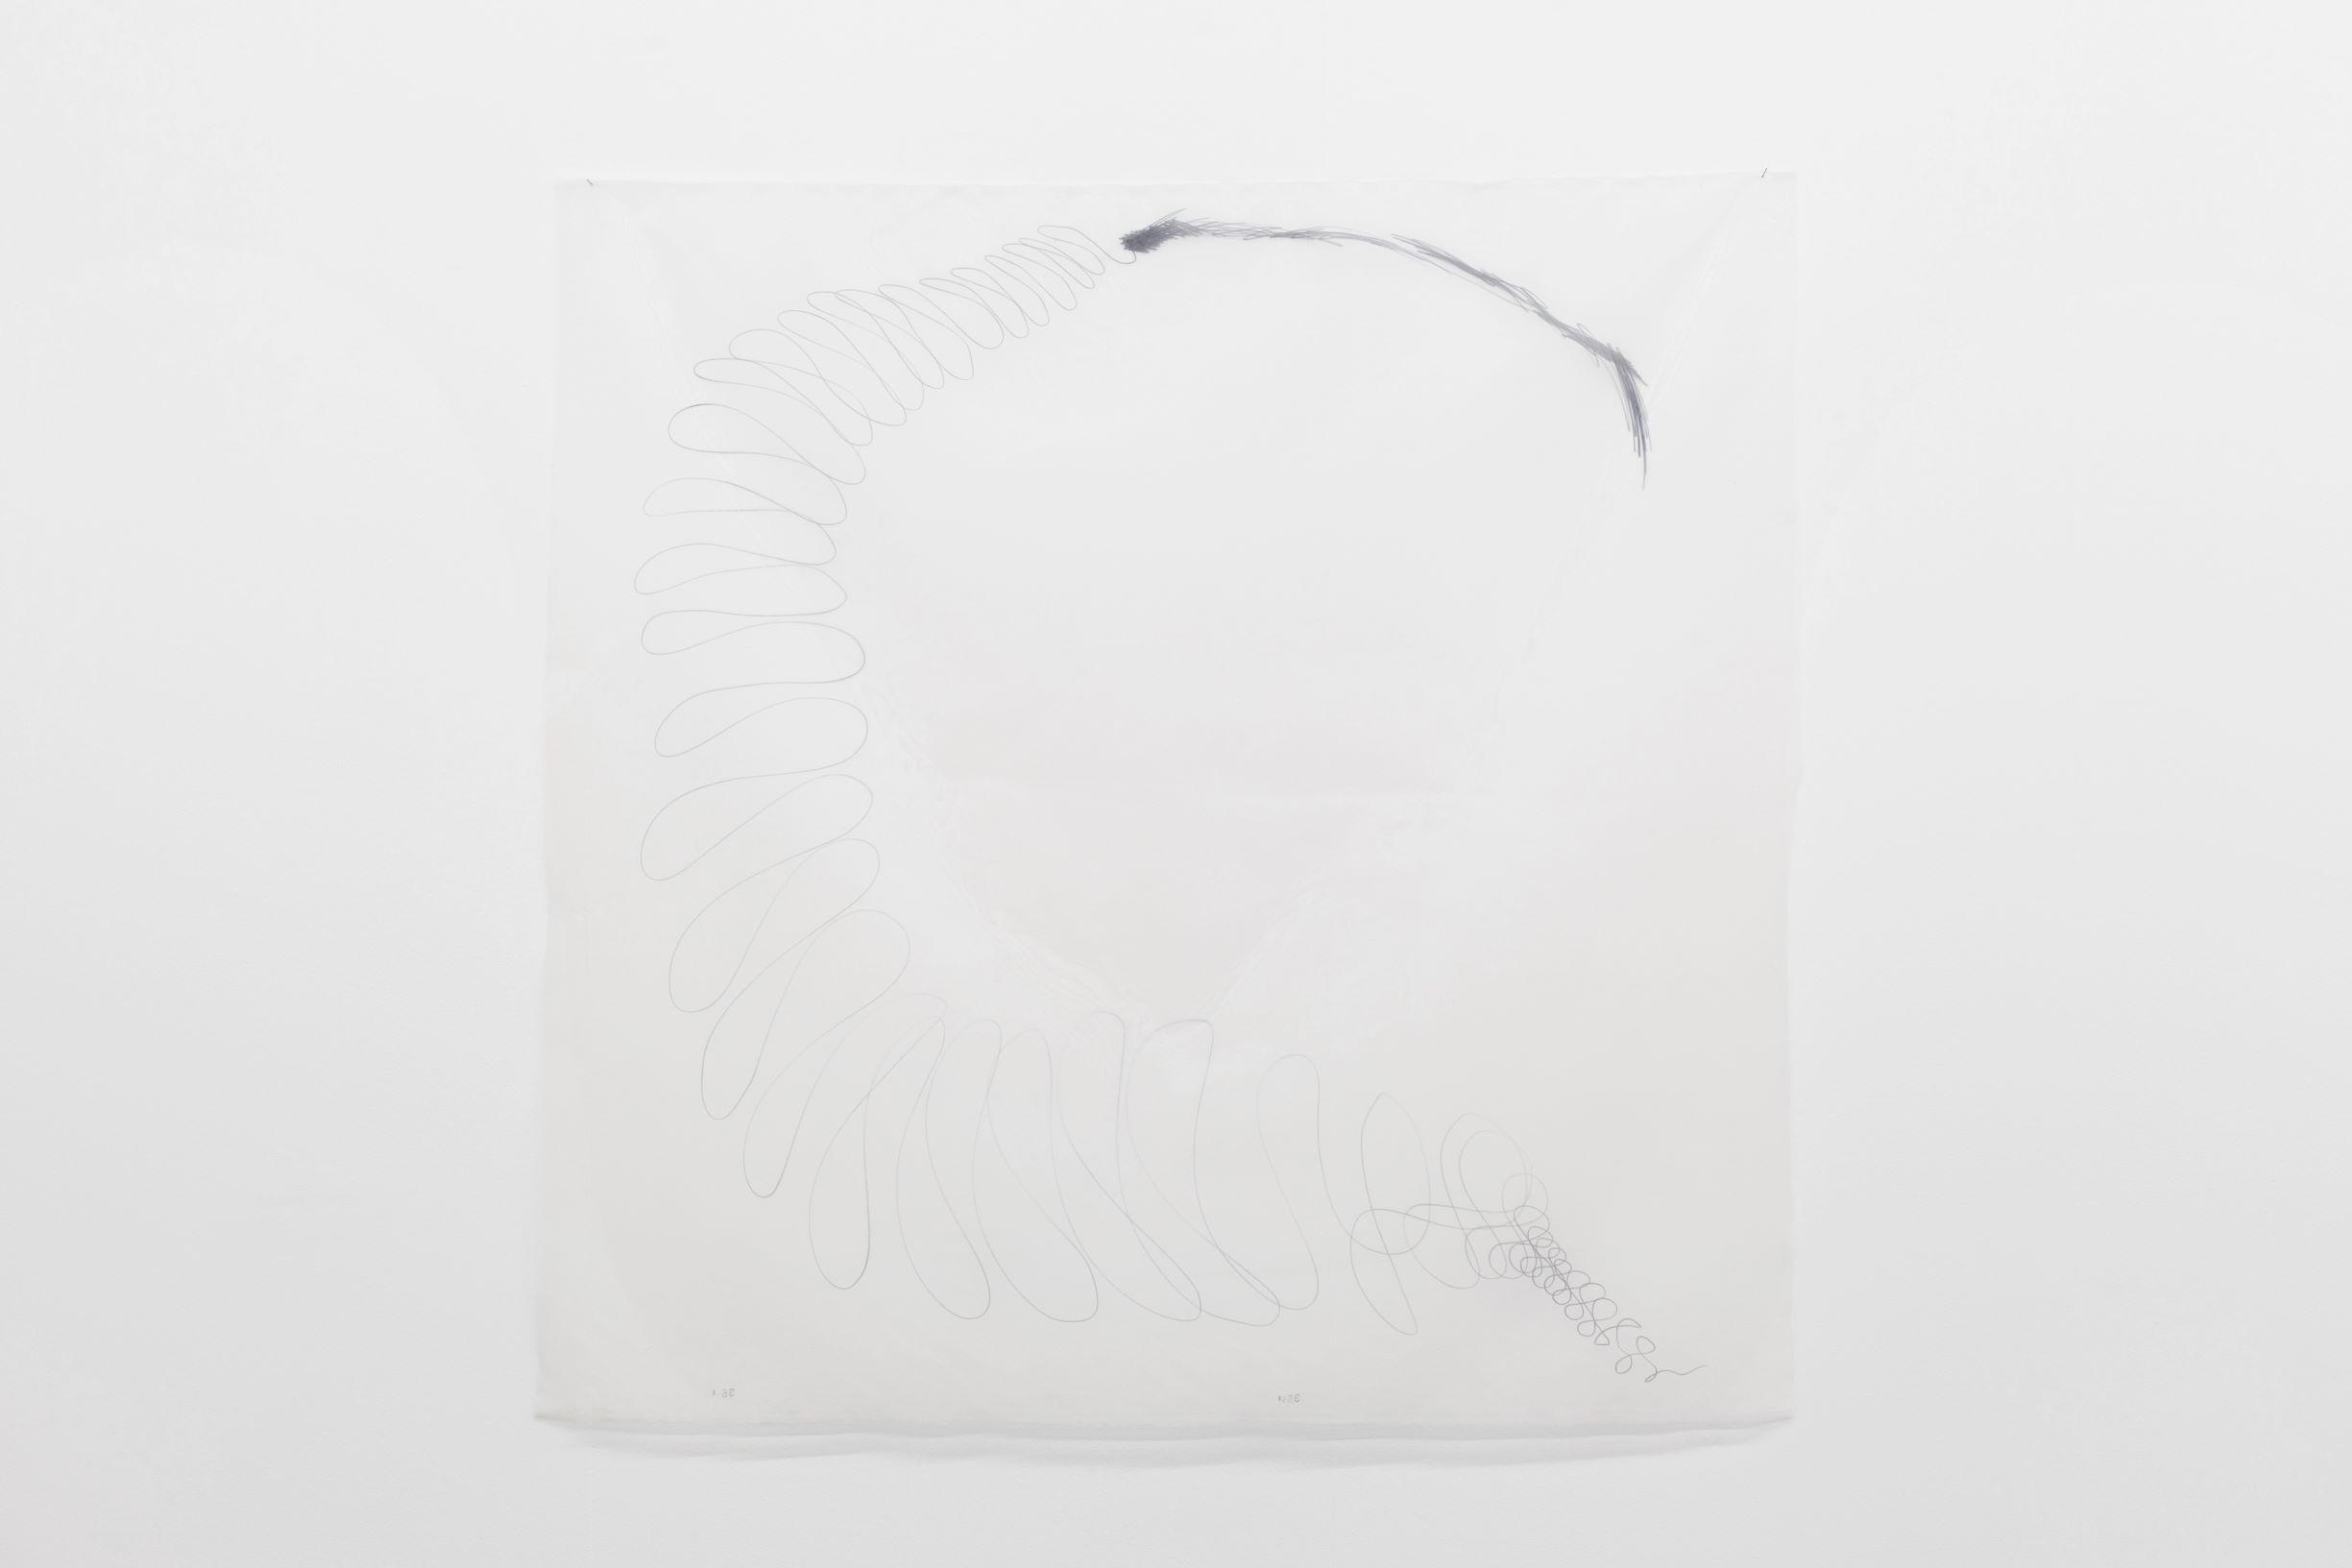 SCRIPTS, Linda Semadeni, Kirchgasse ©Björn Allemann, untitled, 2020, Marker on fabric, 100 x 110 cm.